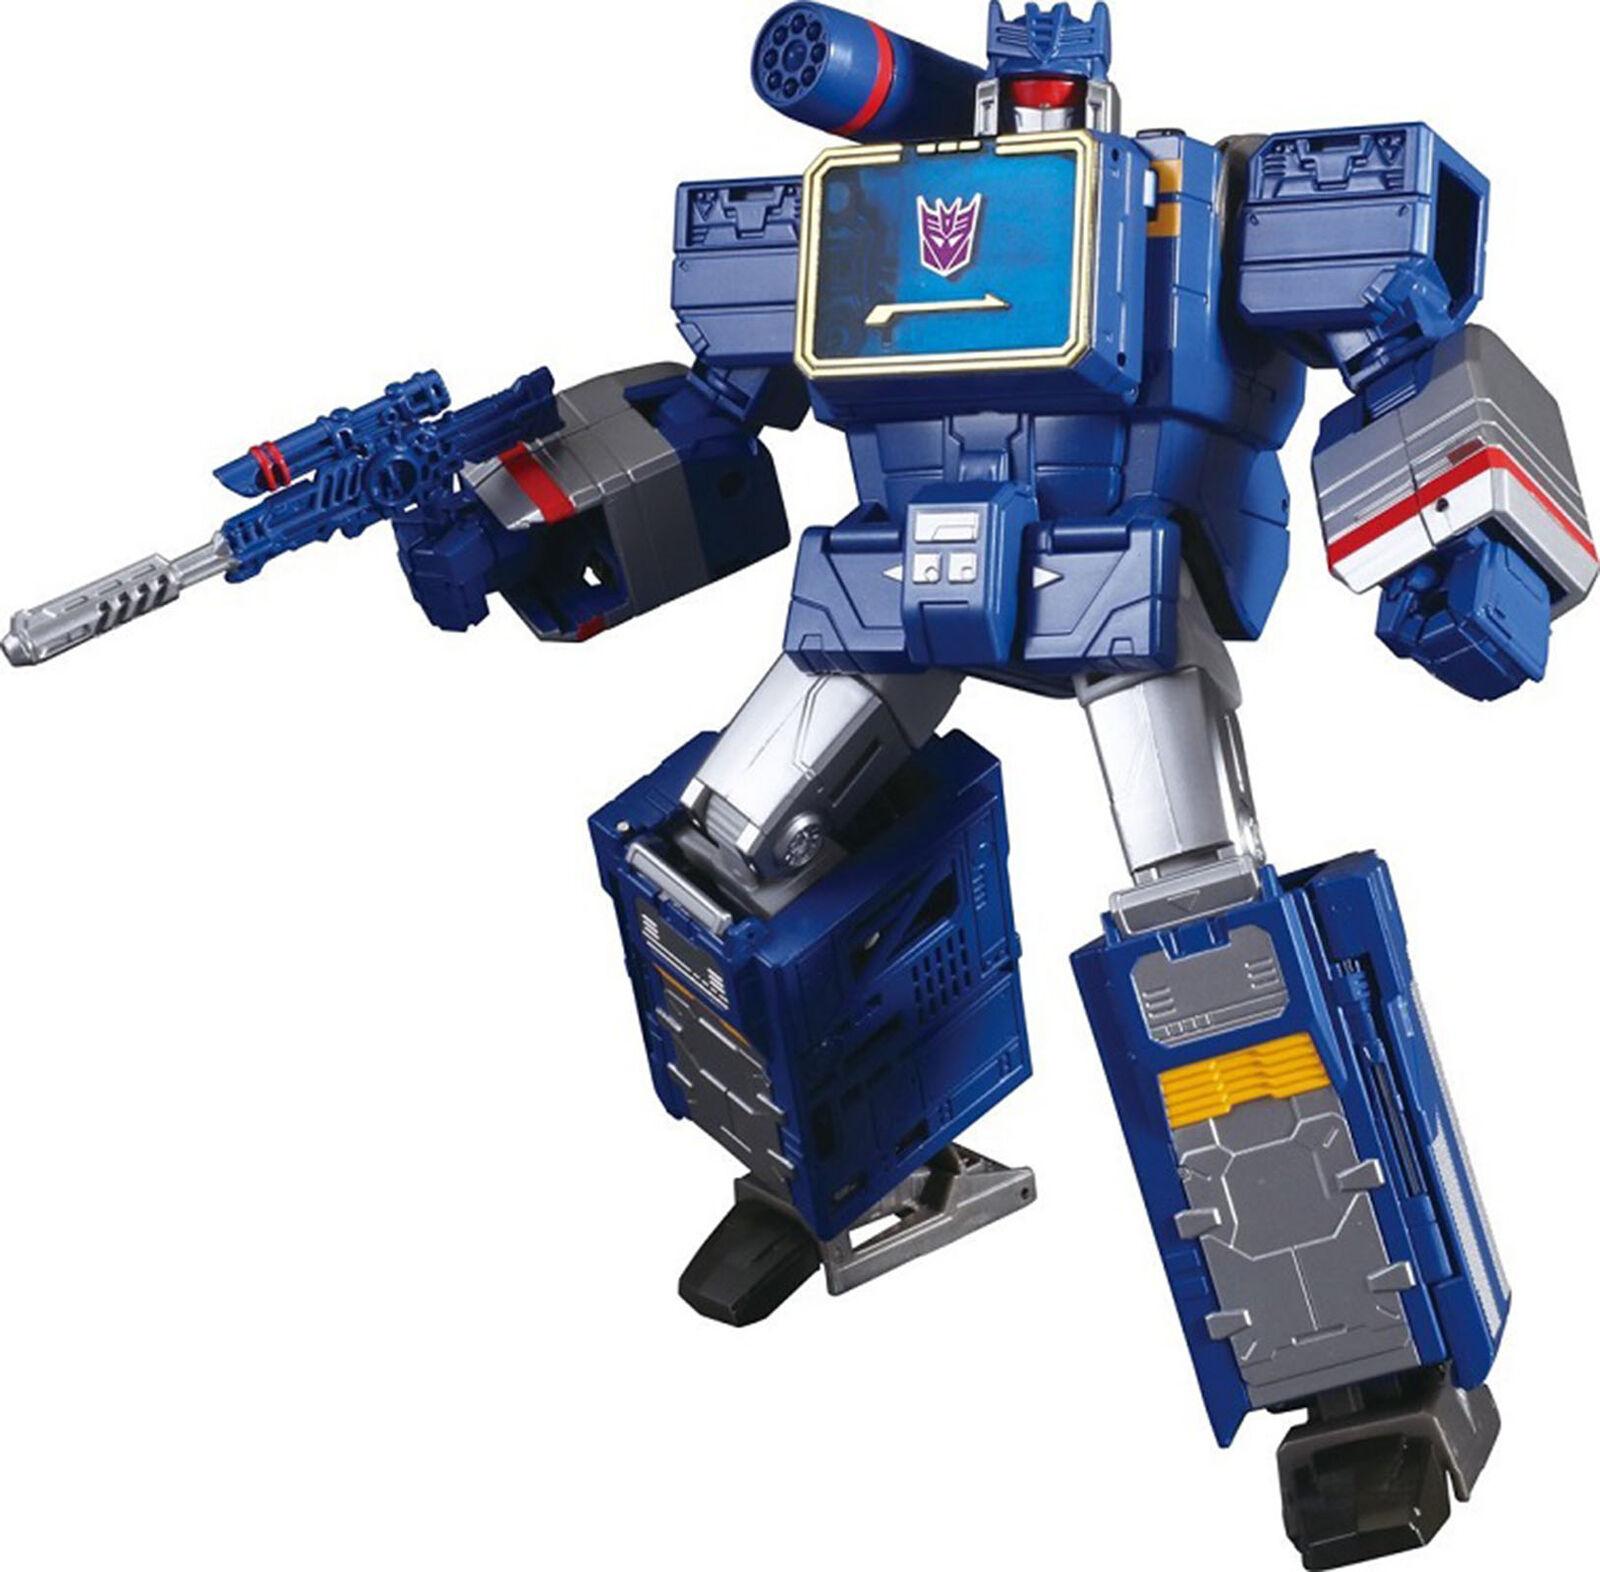 Transformers LG-36 Legends Series LG 36 Soundwave Figura De Acción Juguete Chrismas Nuevo